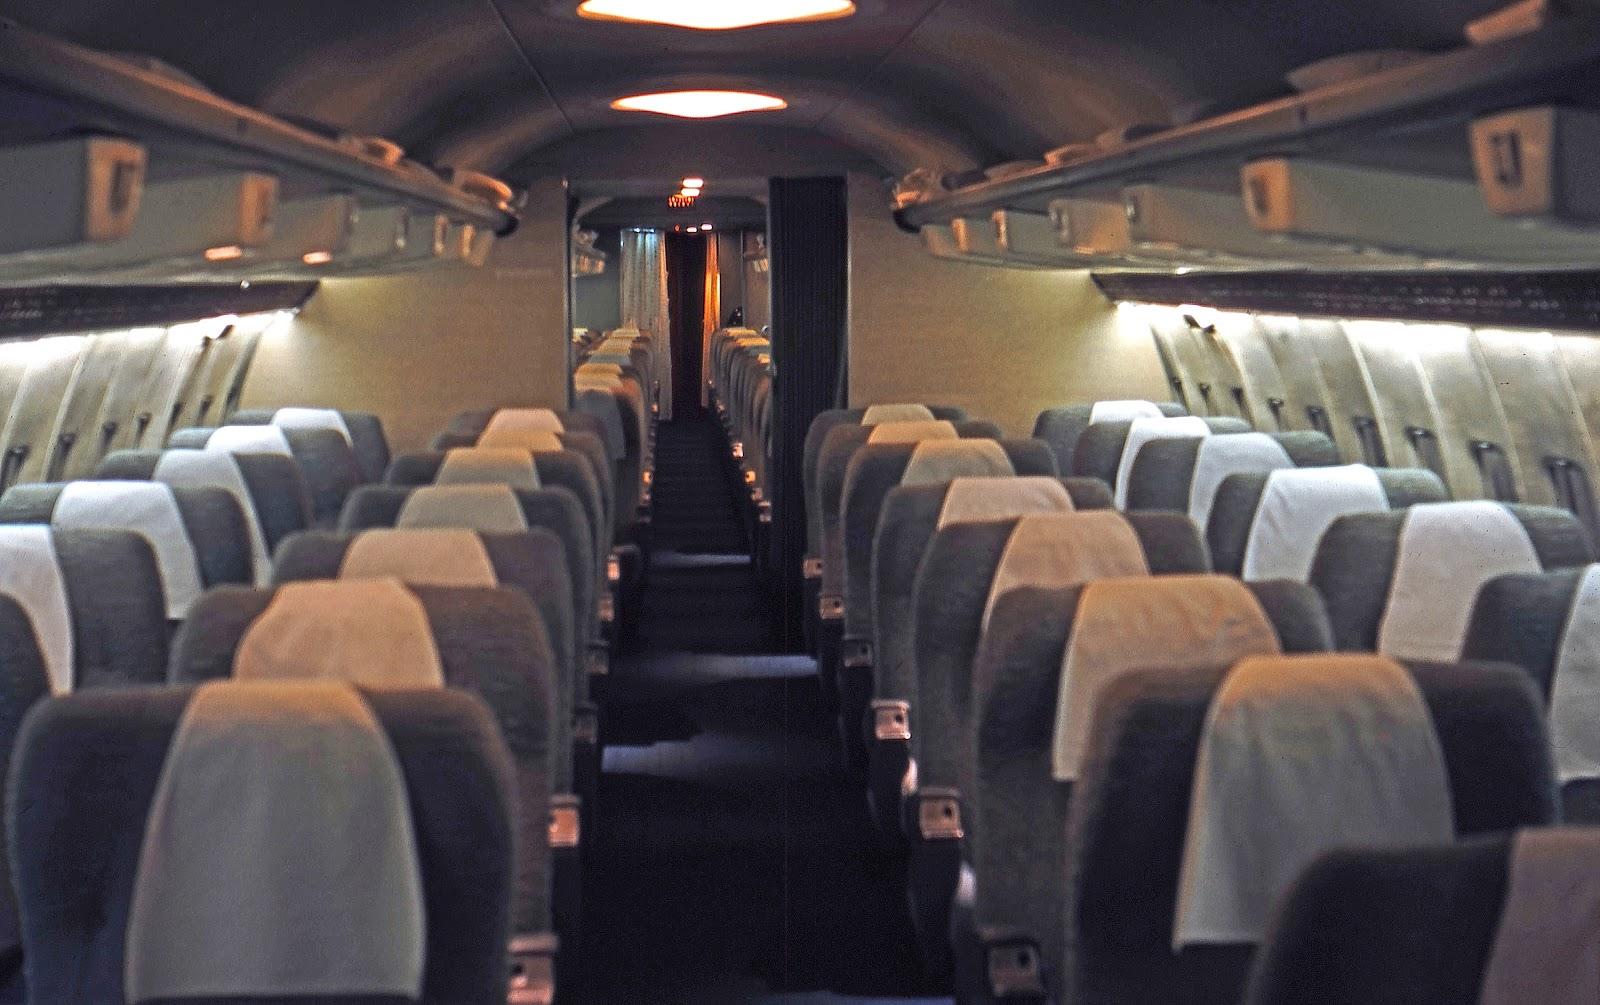 American Airlines 707 Jet Stewardess Oct 28 2015